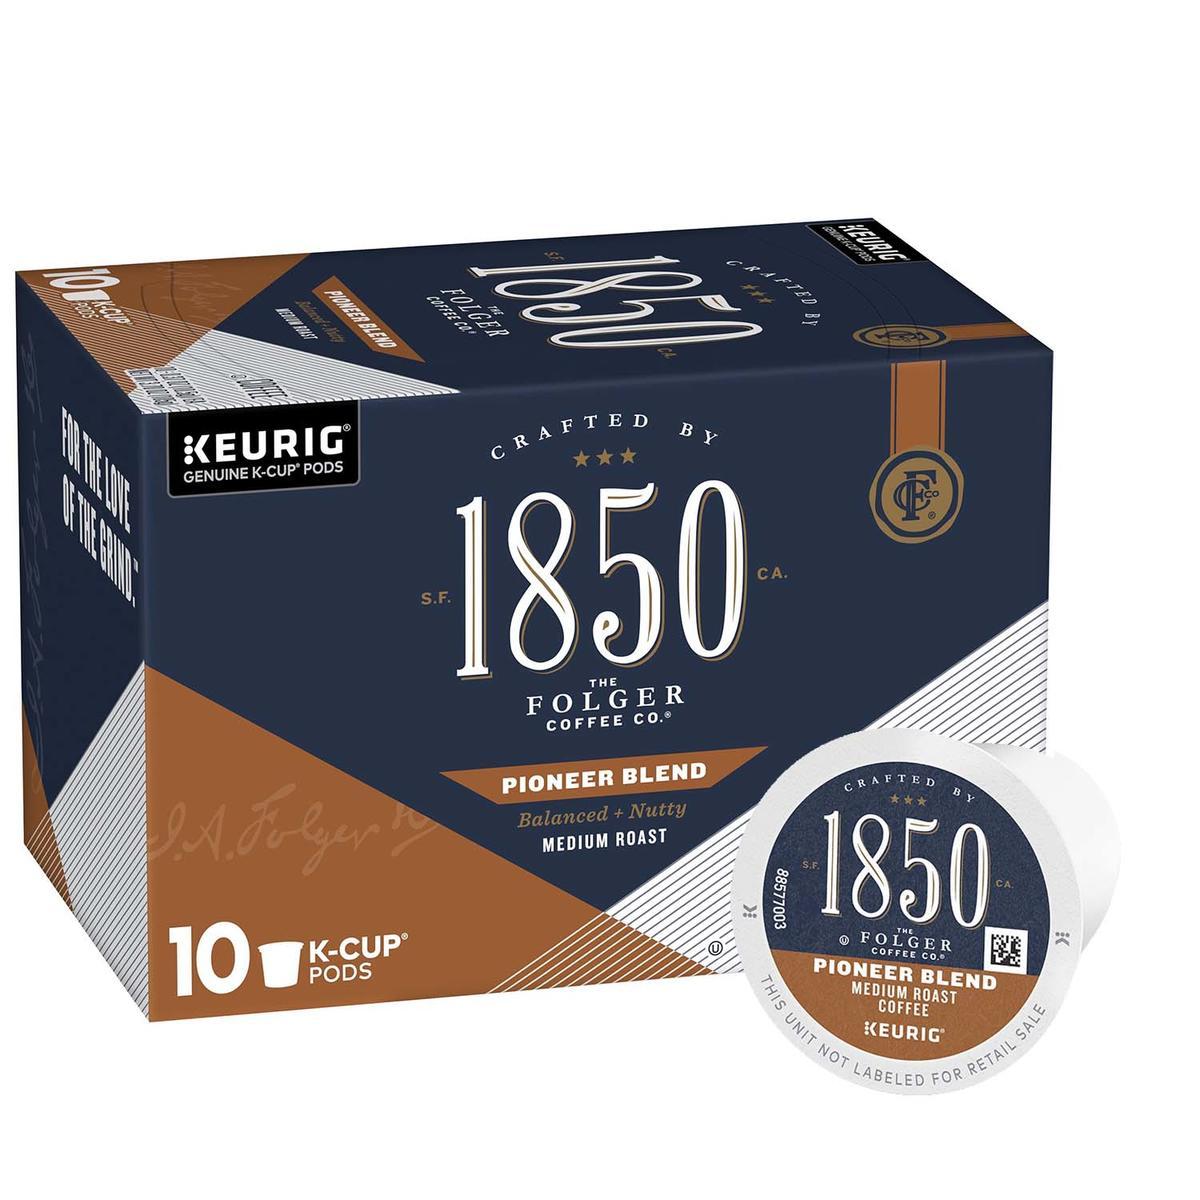 Folgers 1850 medium roast coffee, Pioneer Blend variety, 10 count box of k cups